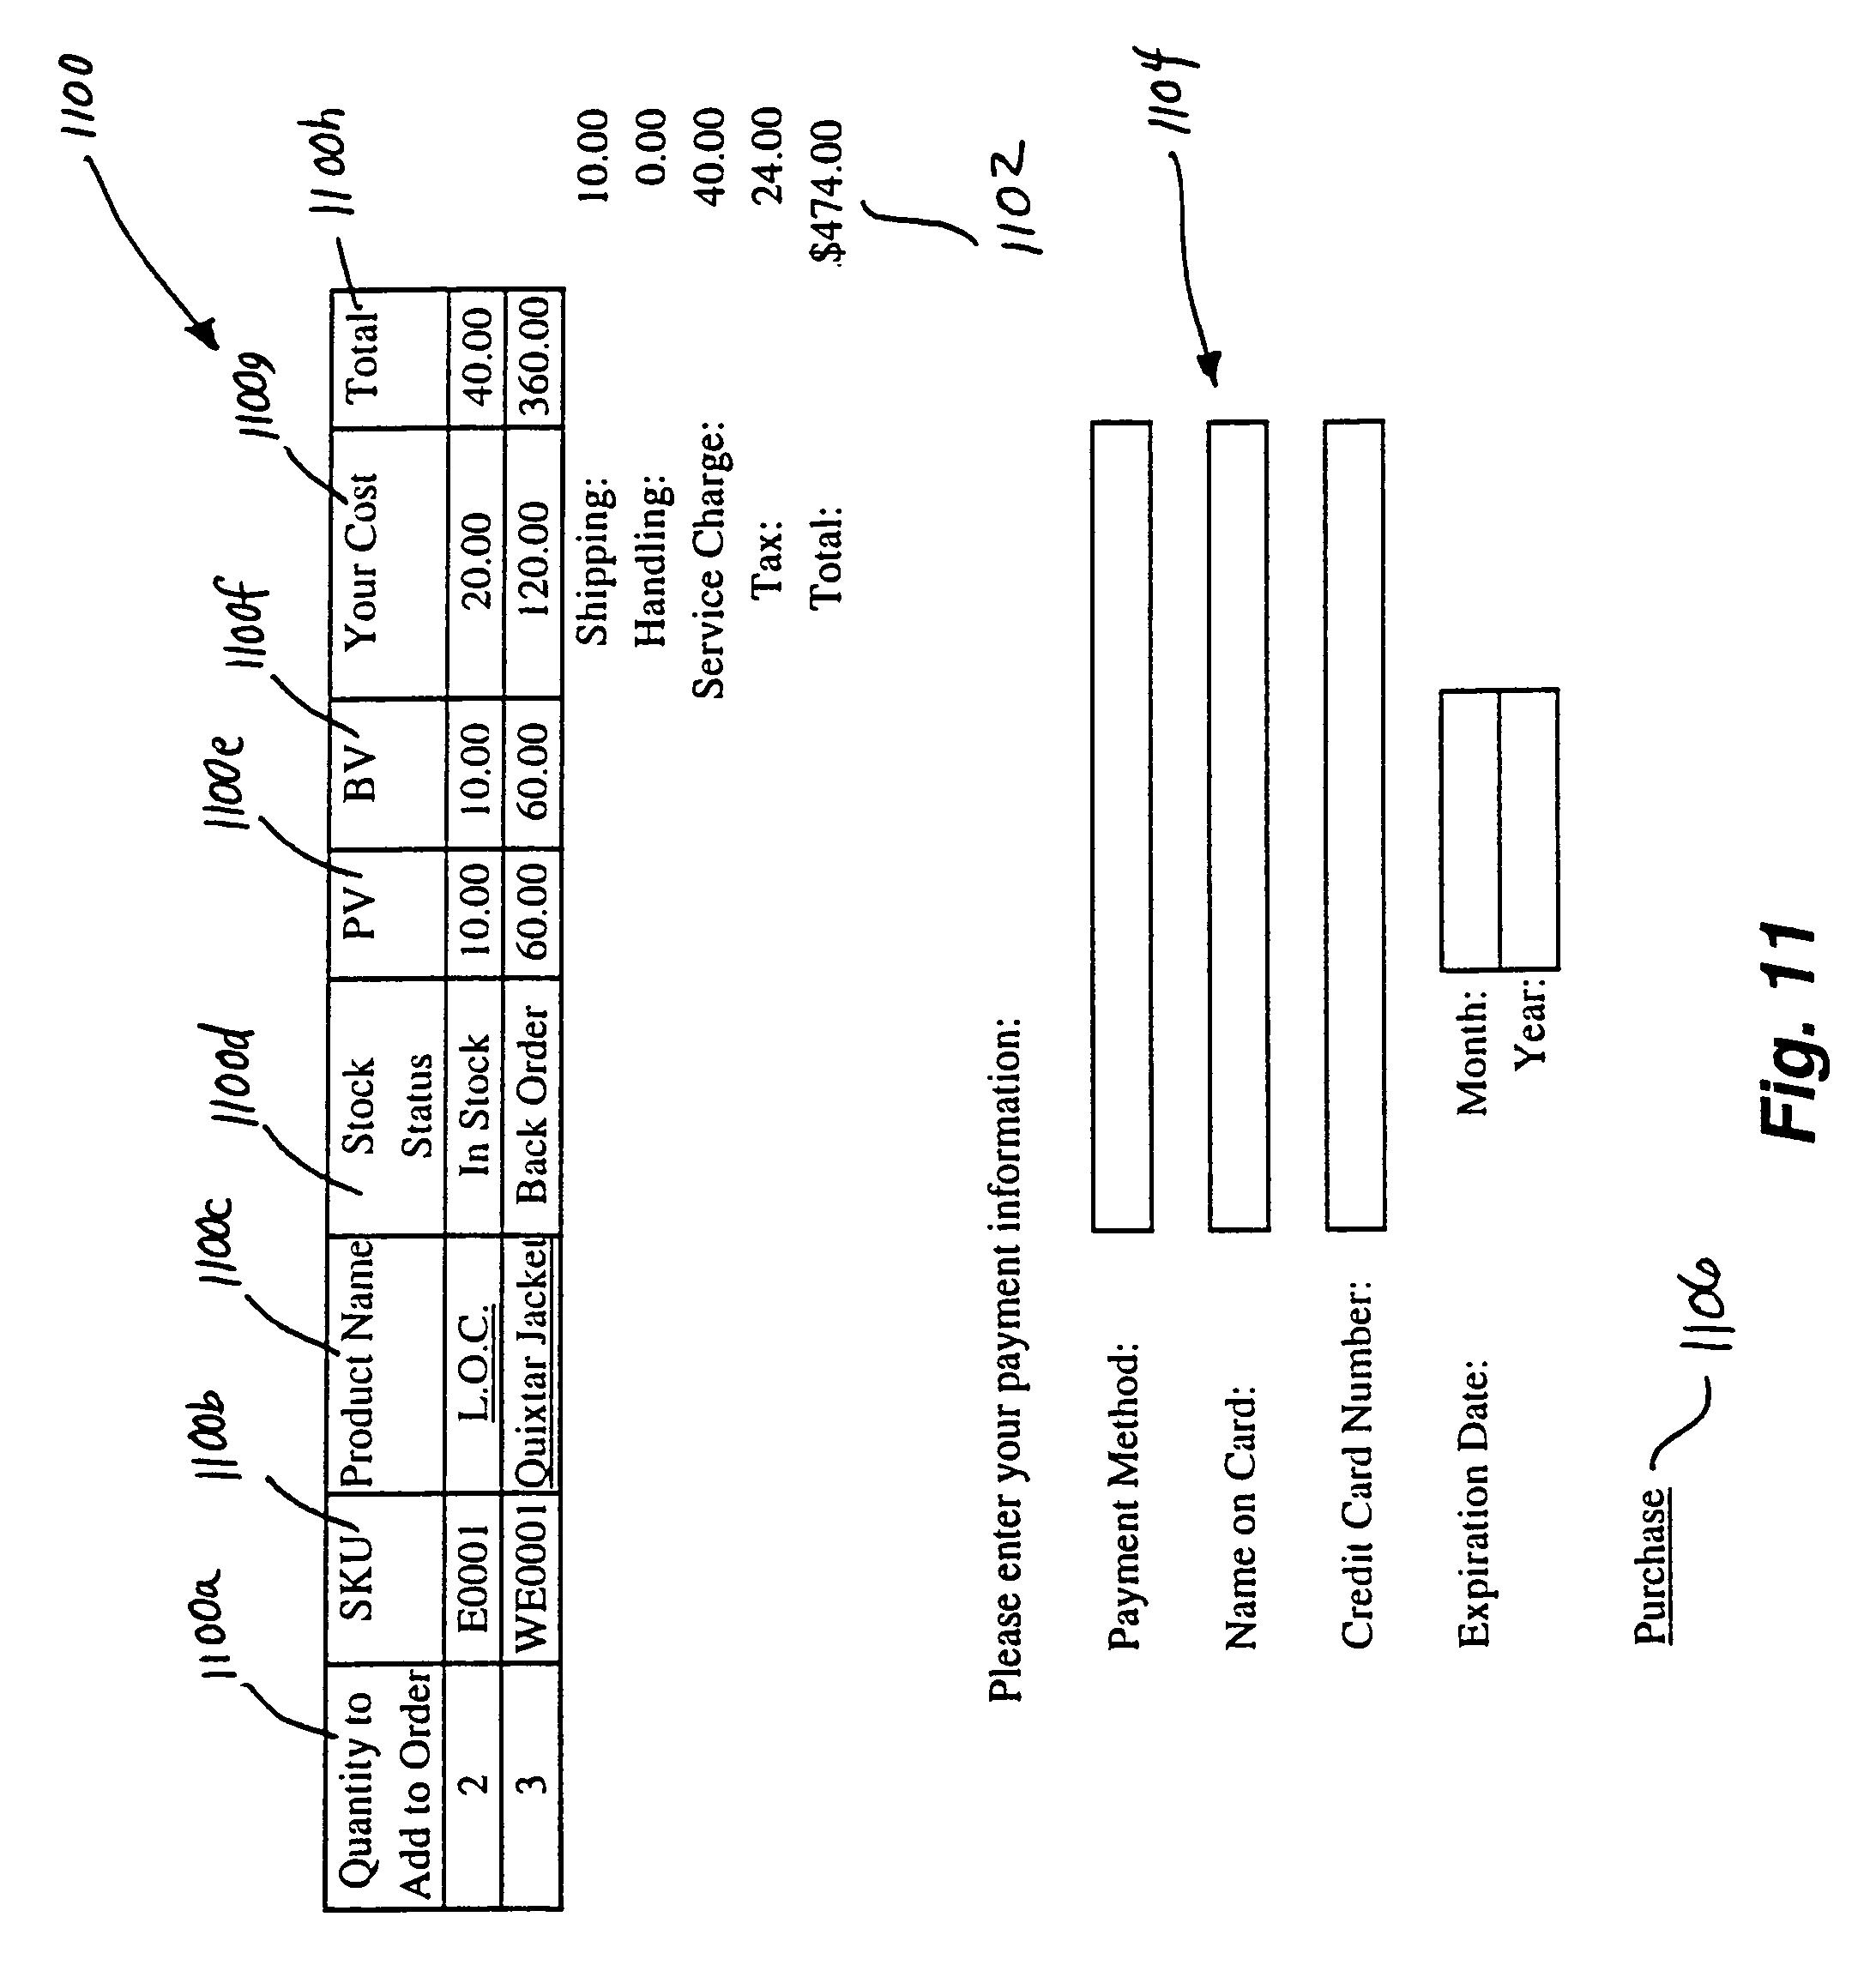 Patent US 6,980,962 B1